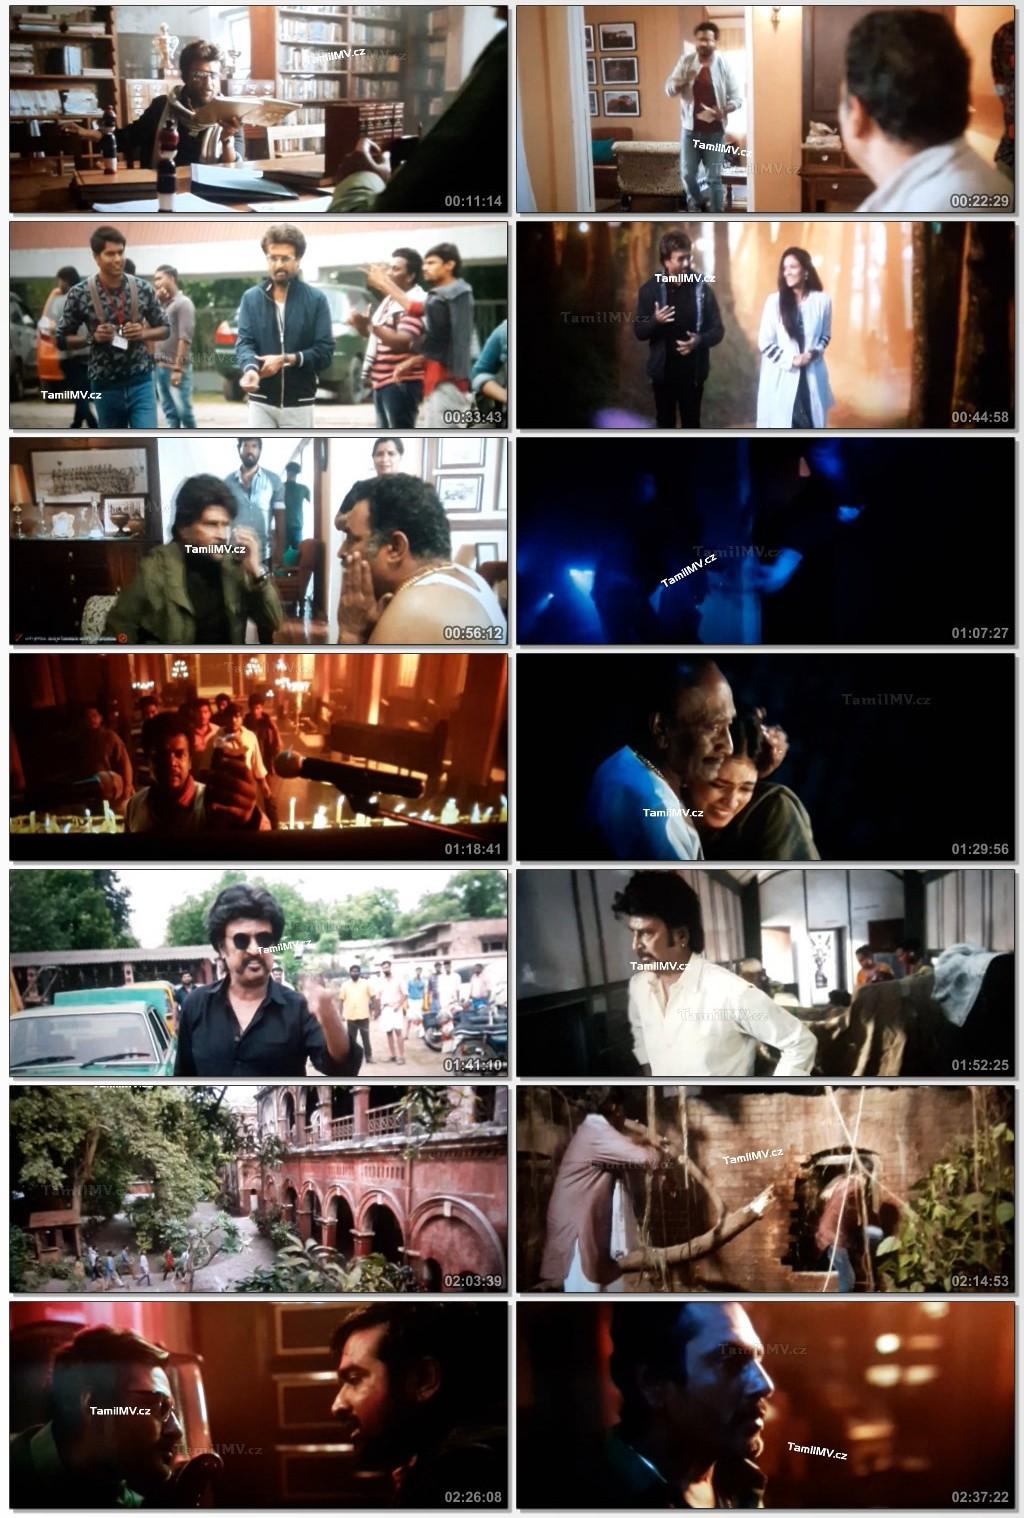 Petta (2019) Tamil 480p 720p pDVDRip, petta movie download tamilrockers